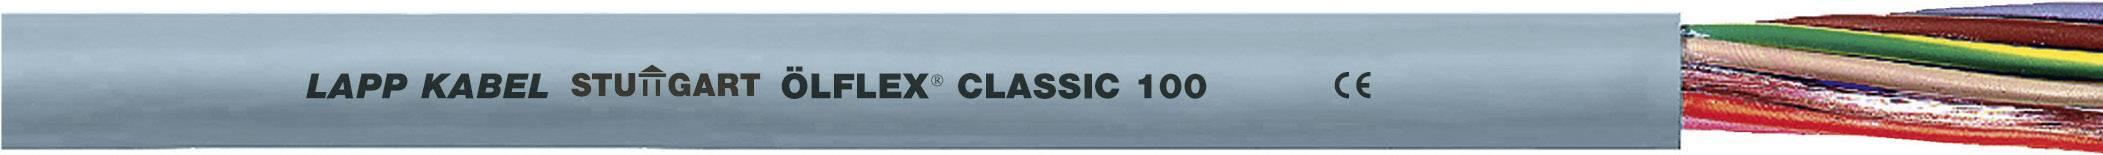 Kabel LappKabel Ölflex CLASSIC 100 3G6 (0010105), PVC, 12,6 mm, 750 V, šedá, 1000 m